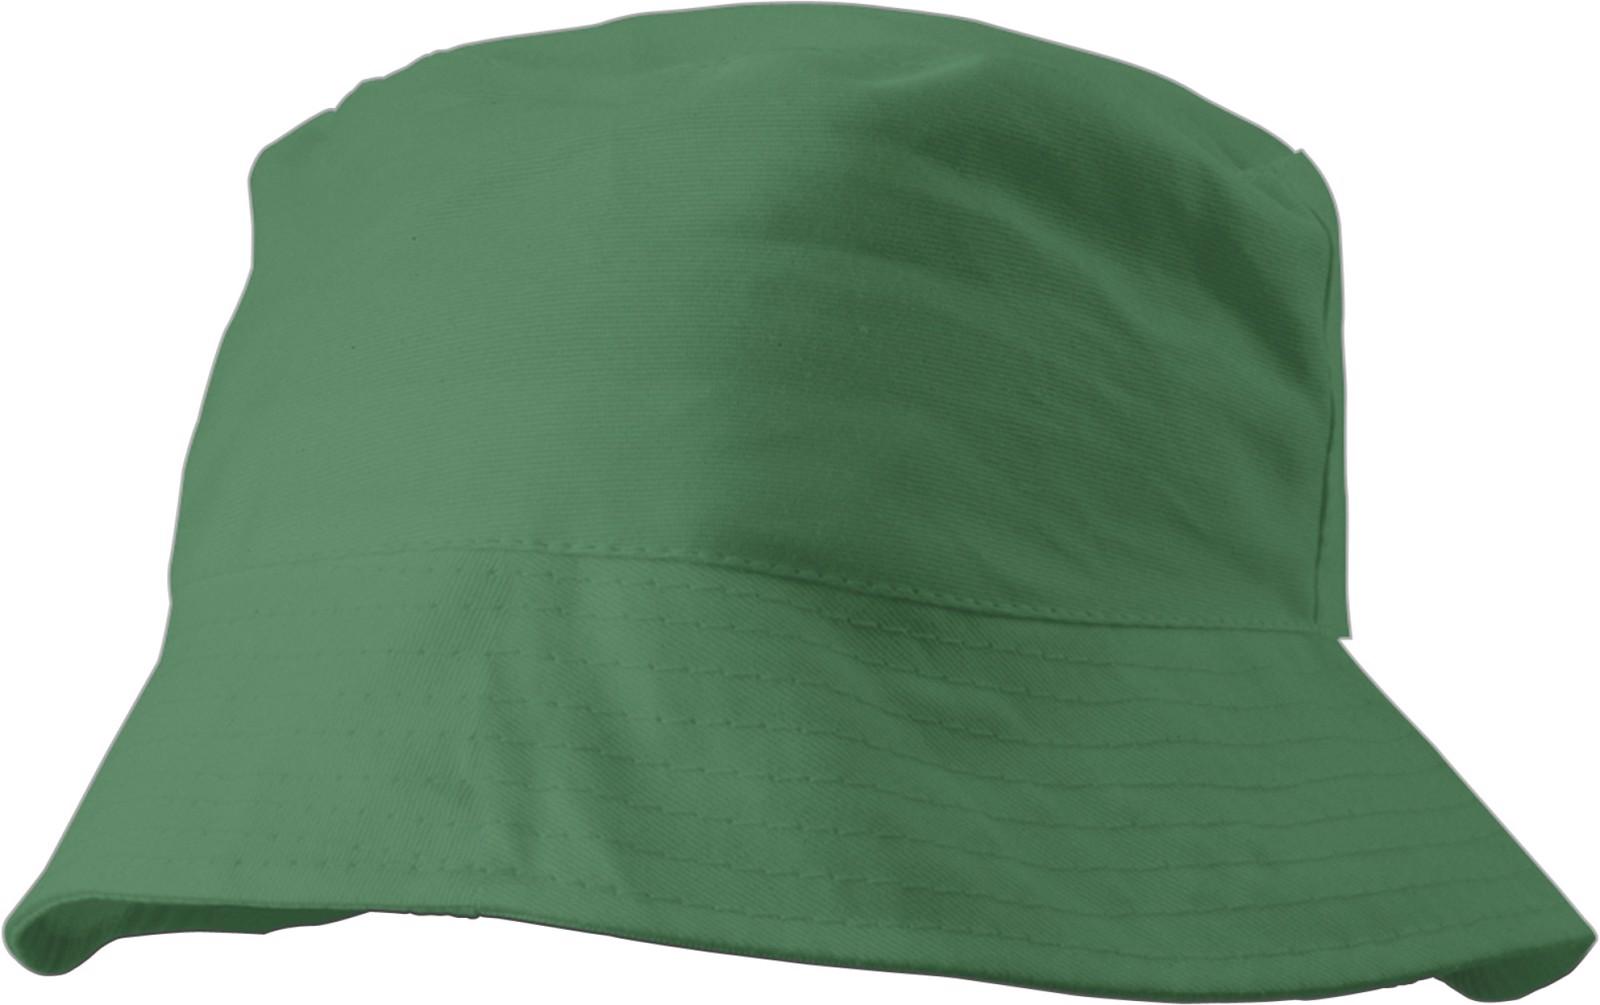 Cotton sun hat - Green